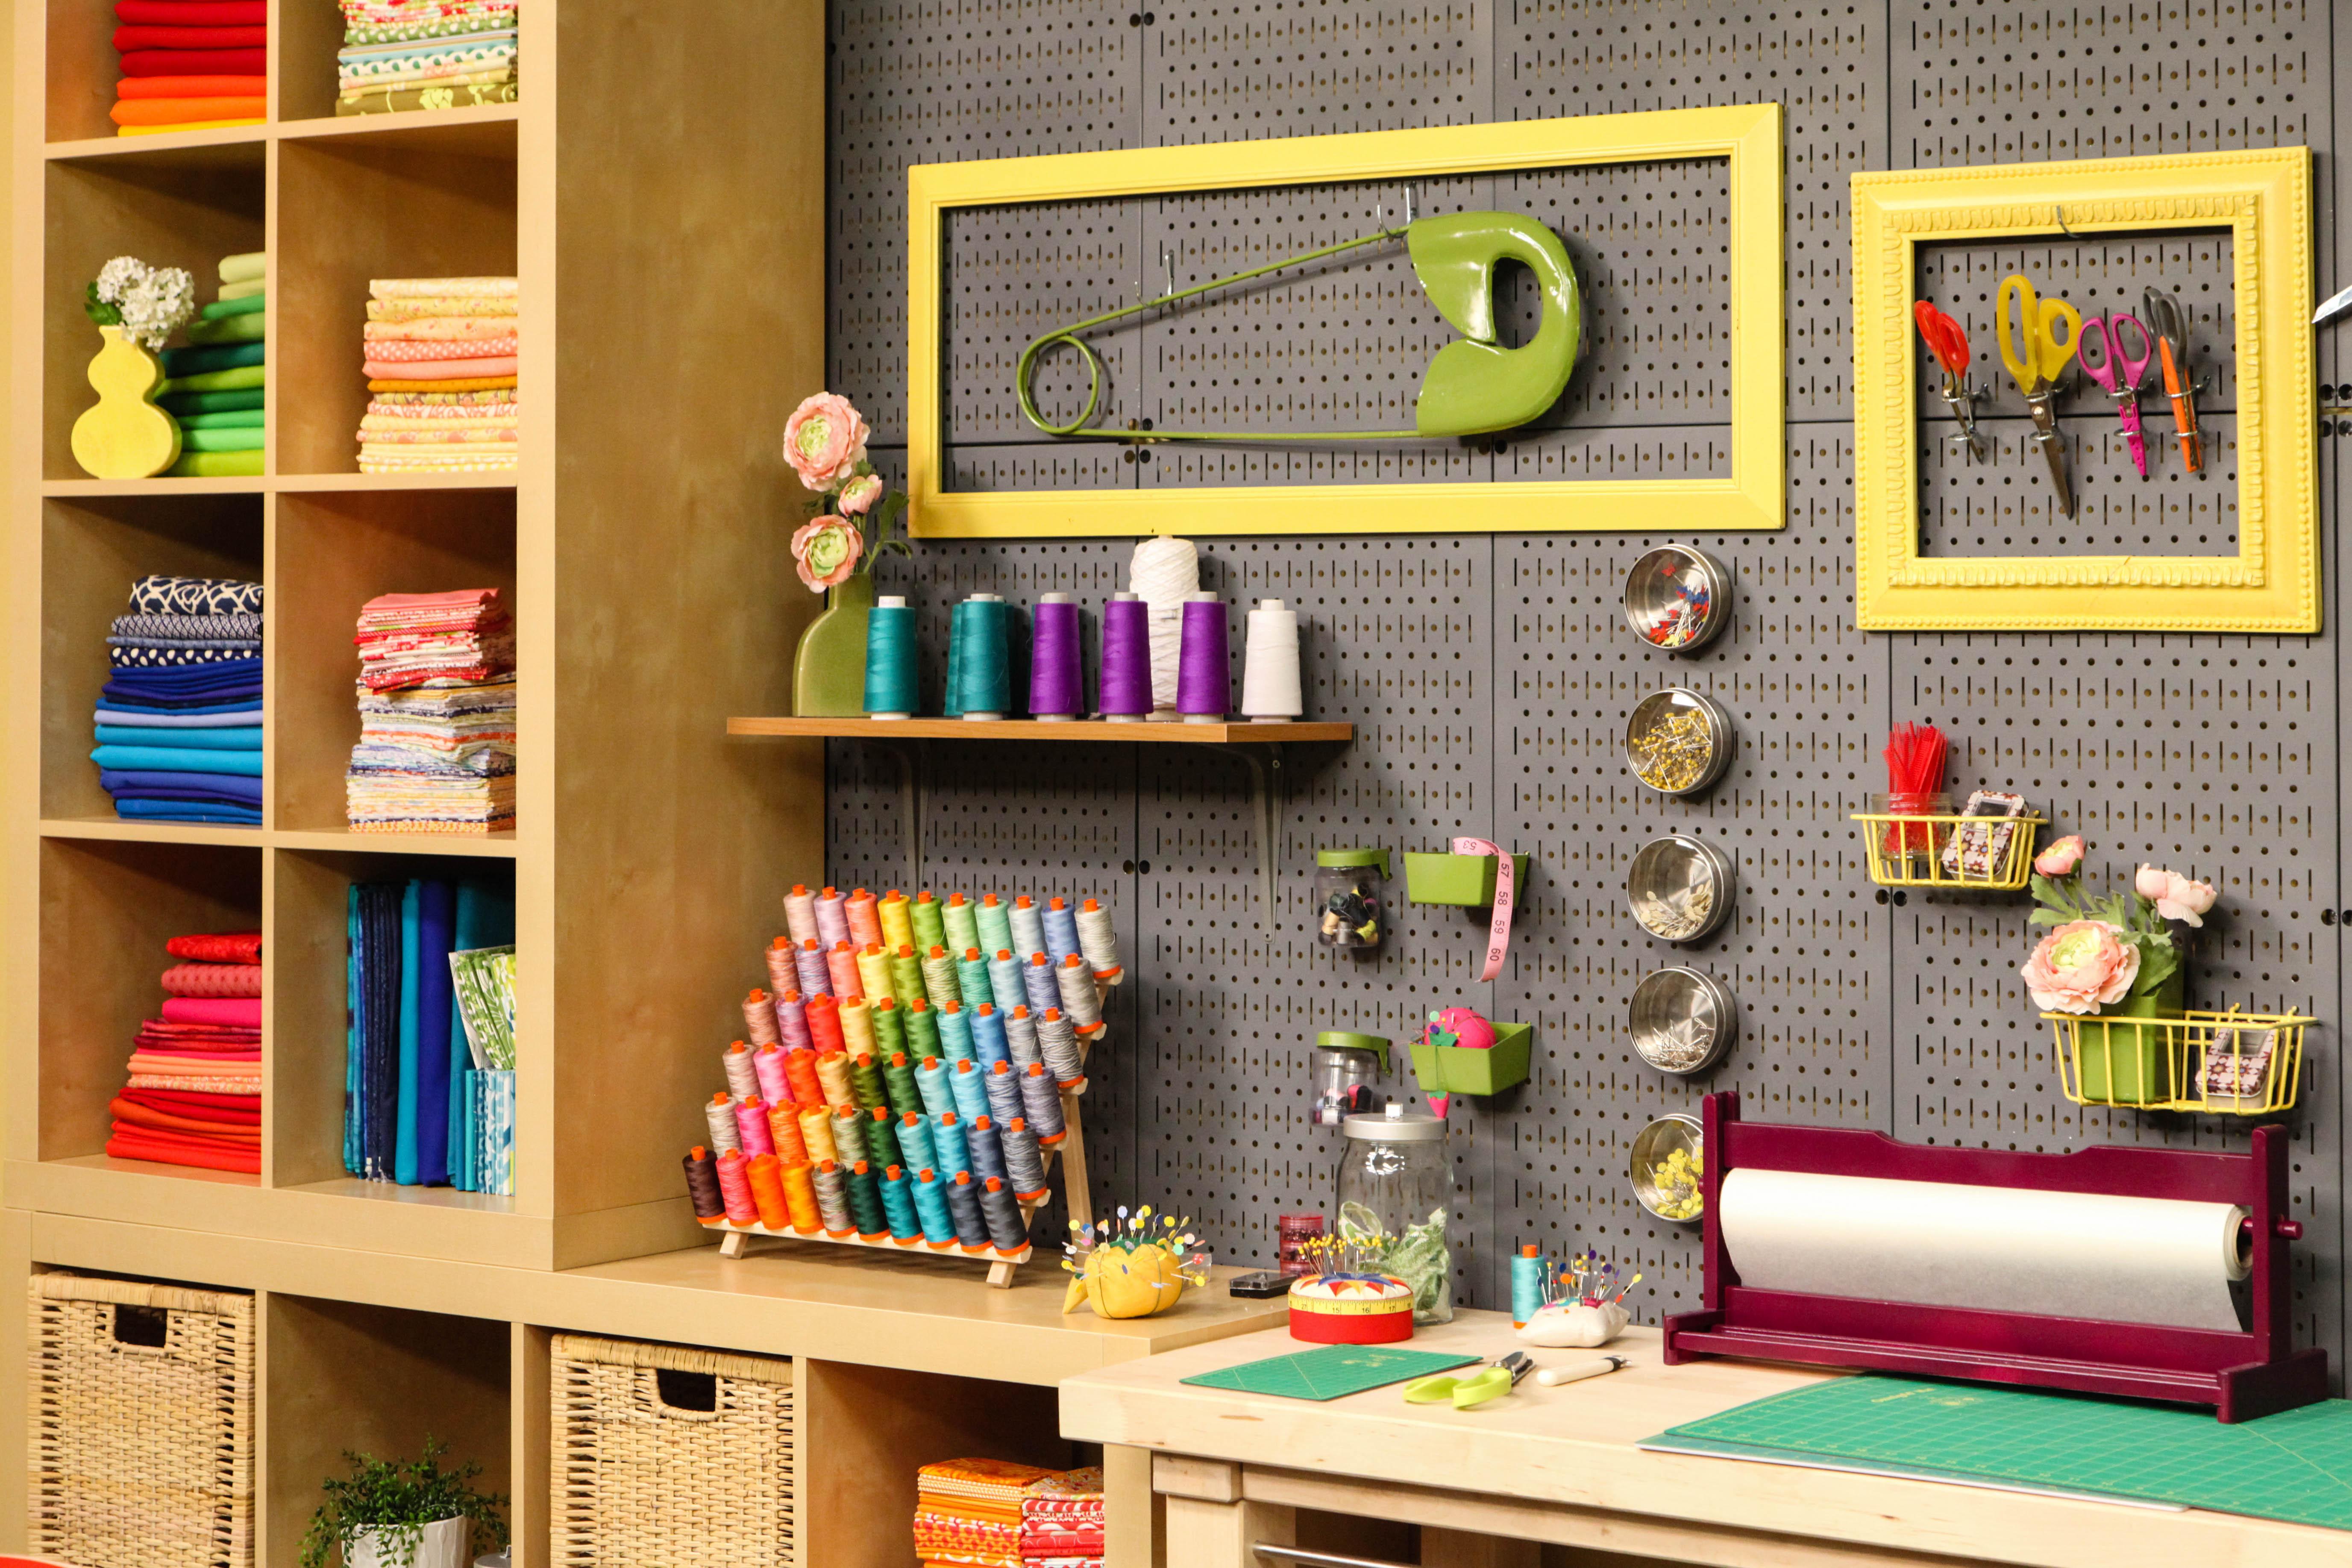 Perfect Organization in the Bluprint Quilting Studio